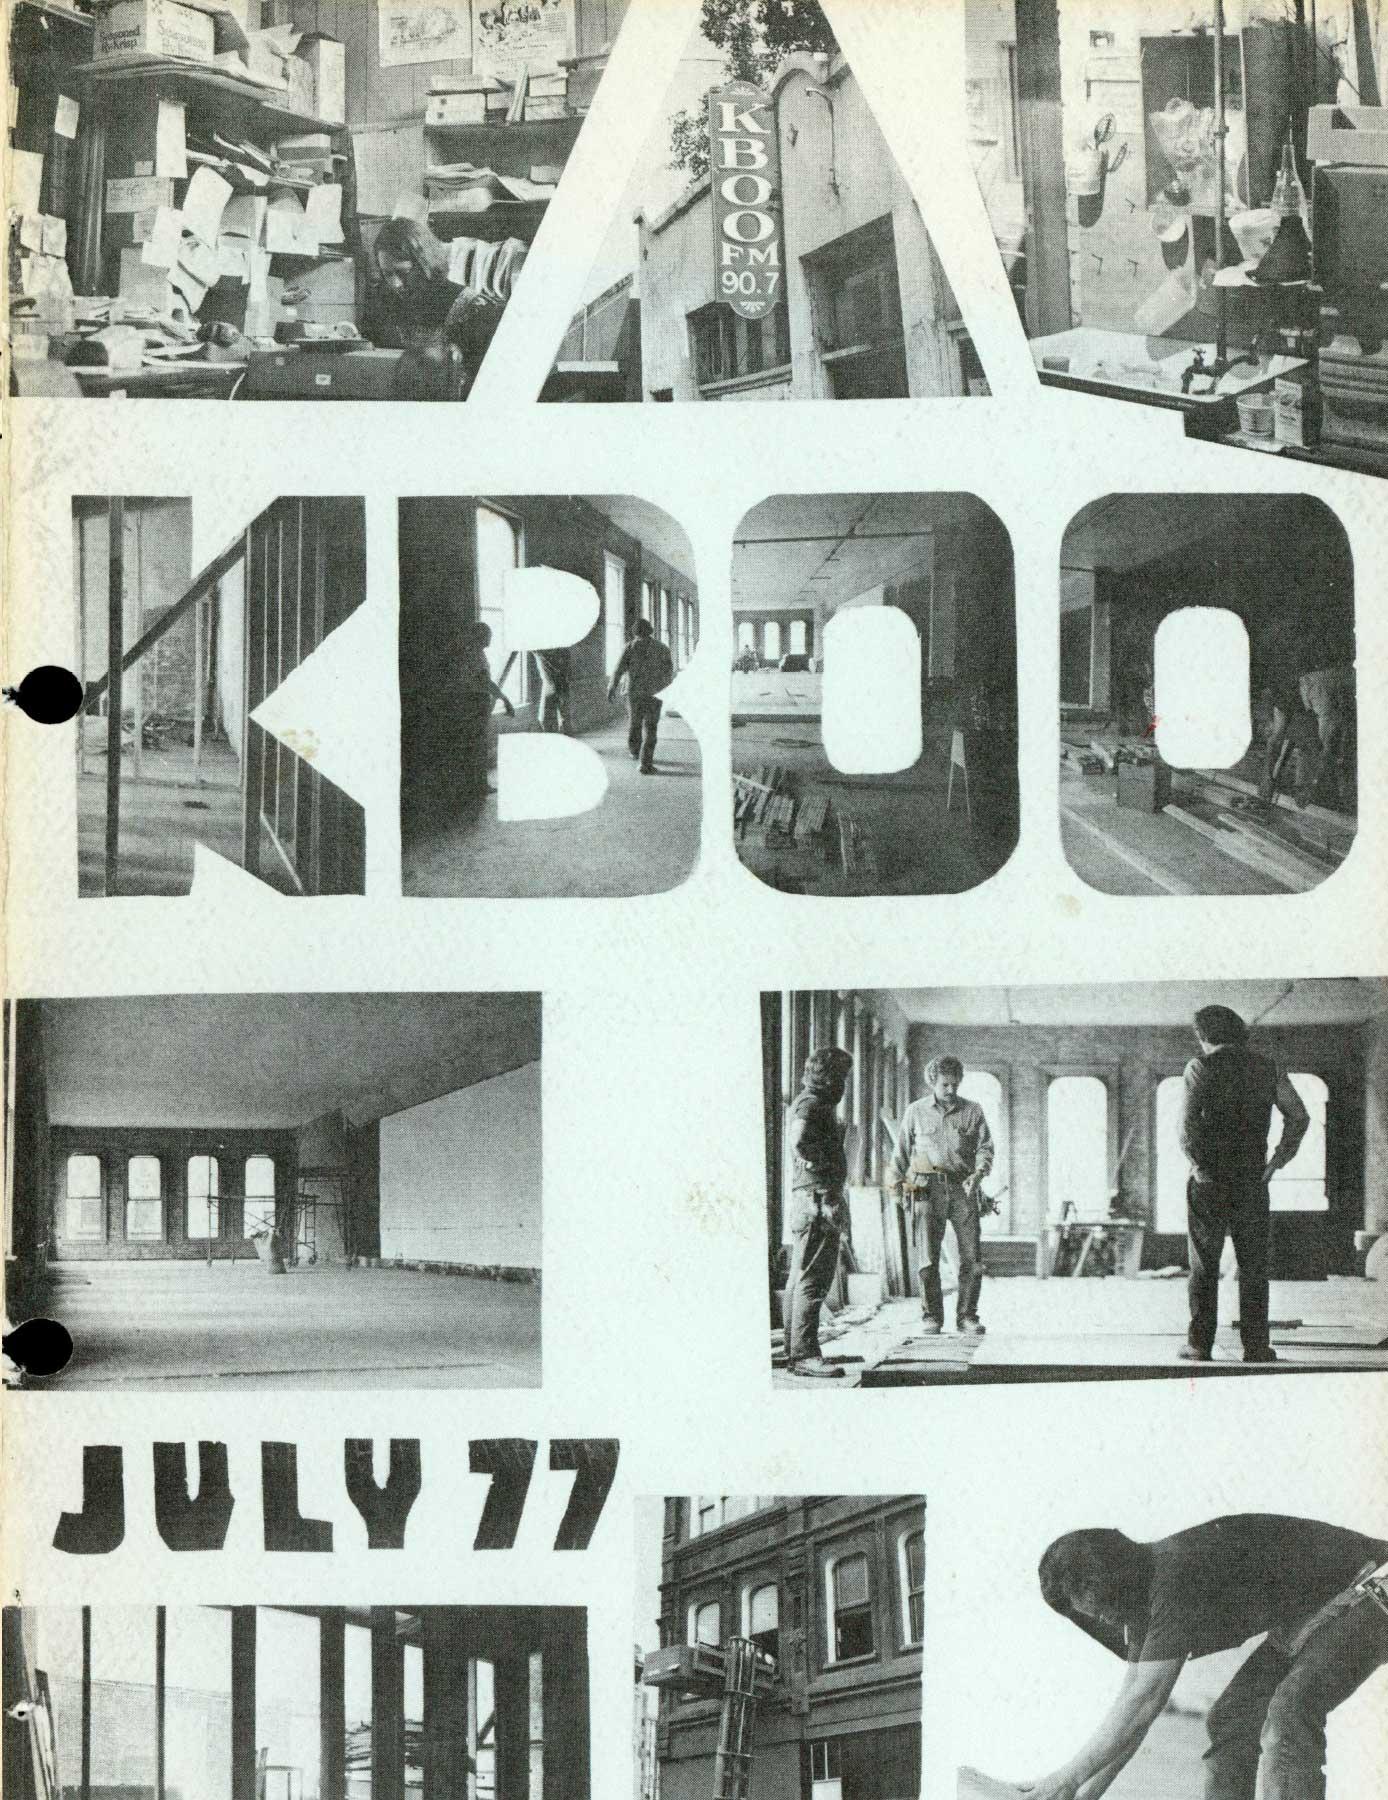 KBOO-Vintage-5.jpg